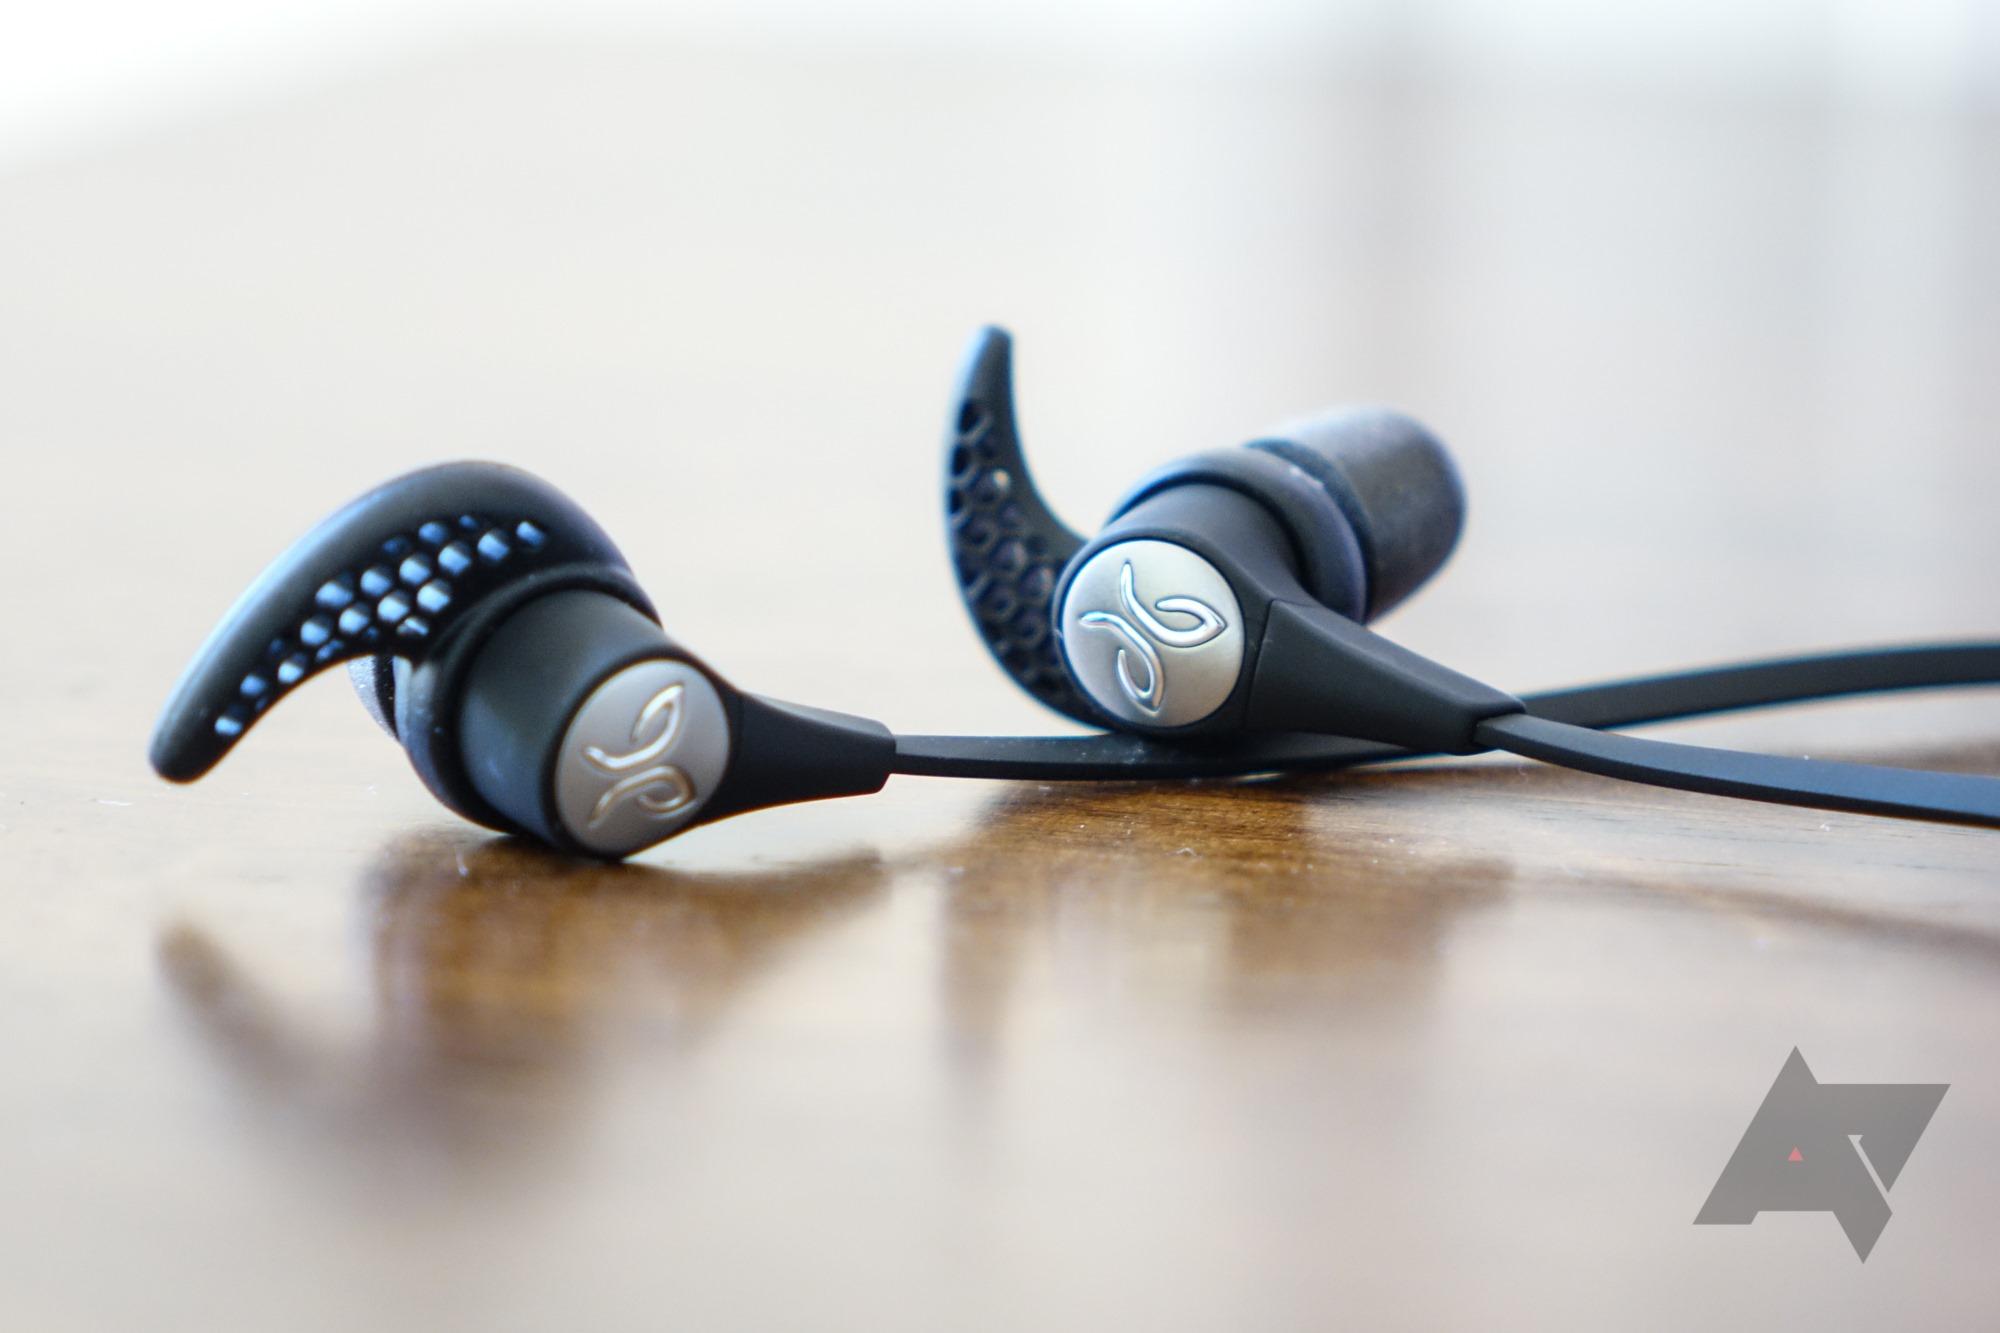 Weekend poll: Do you use Bluetooth headphones?